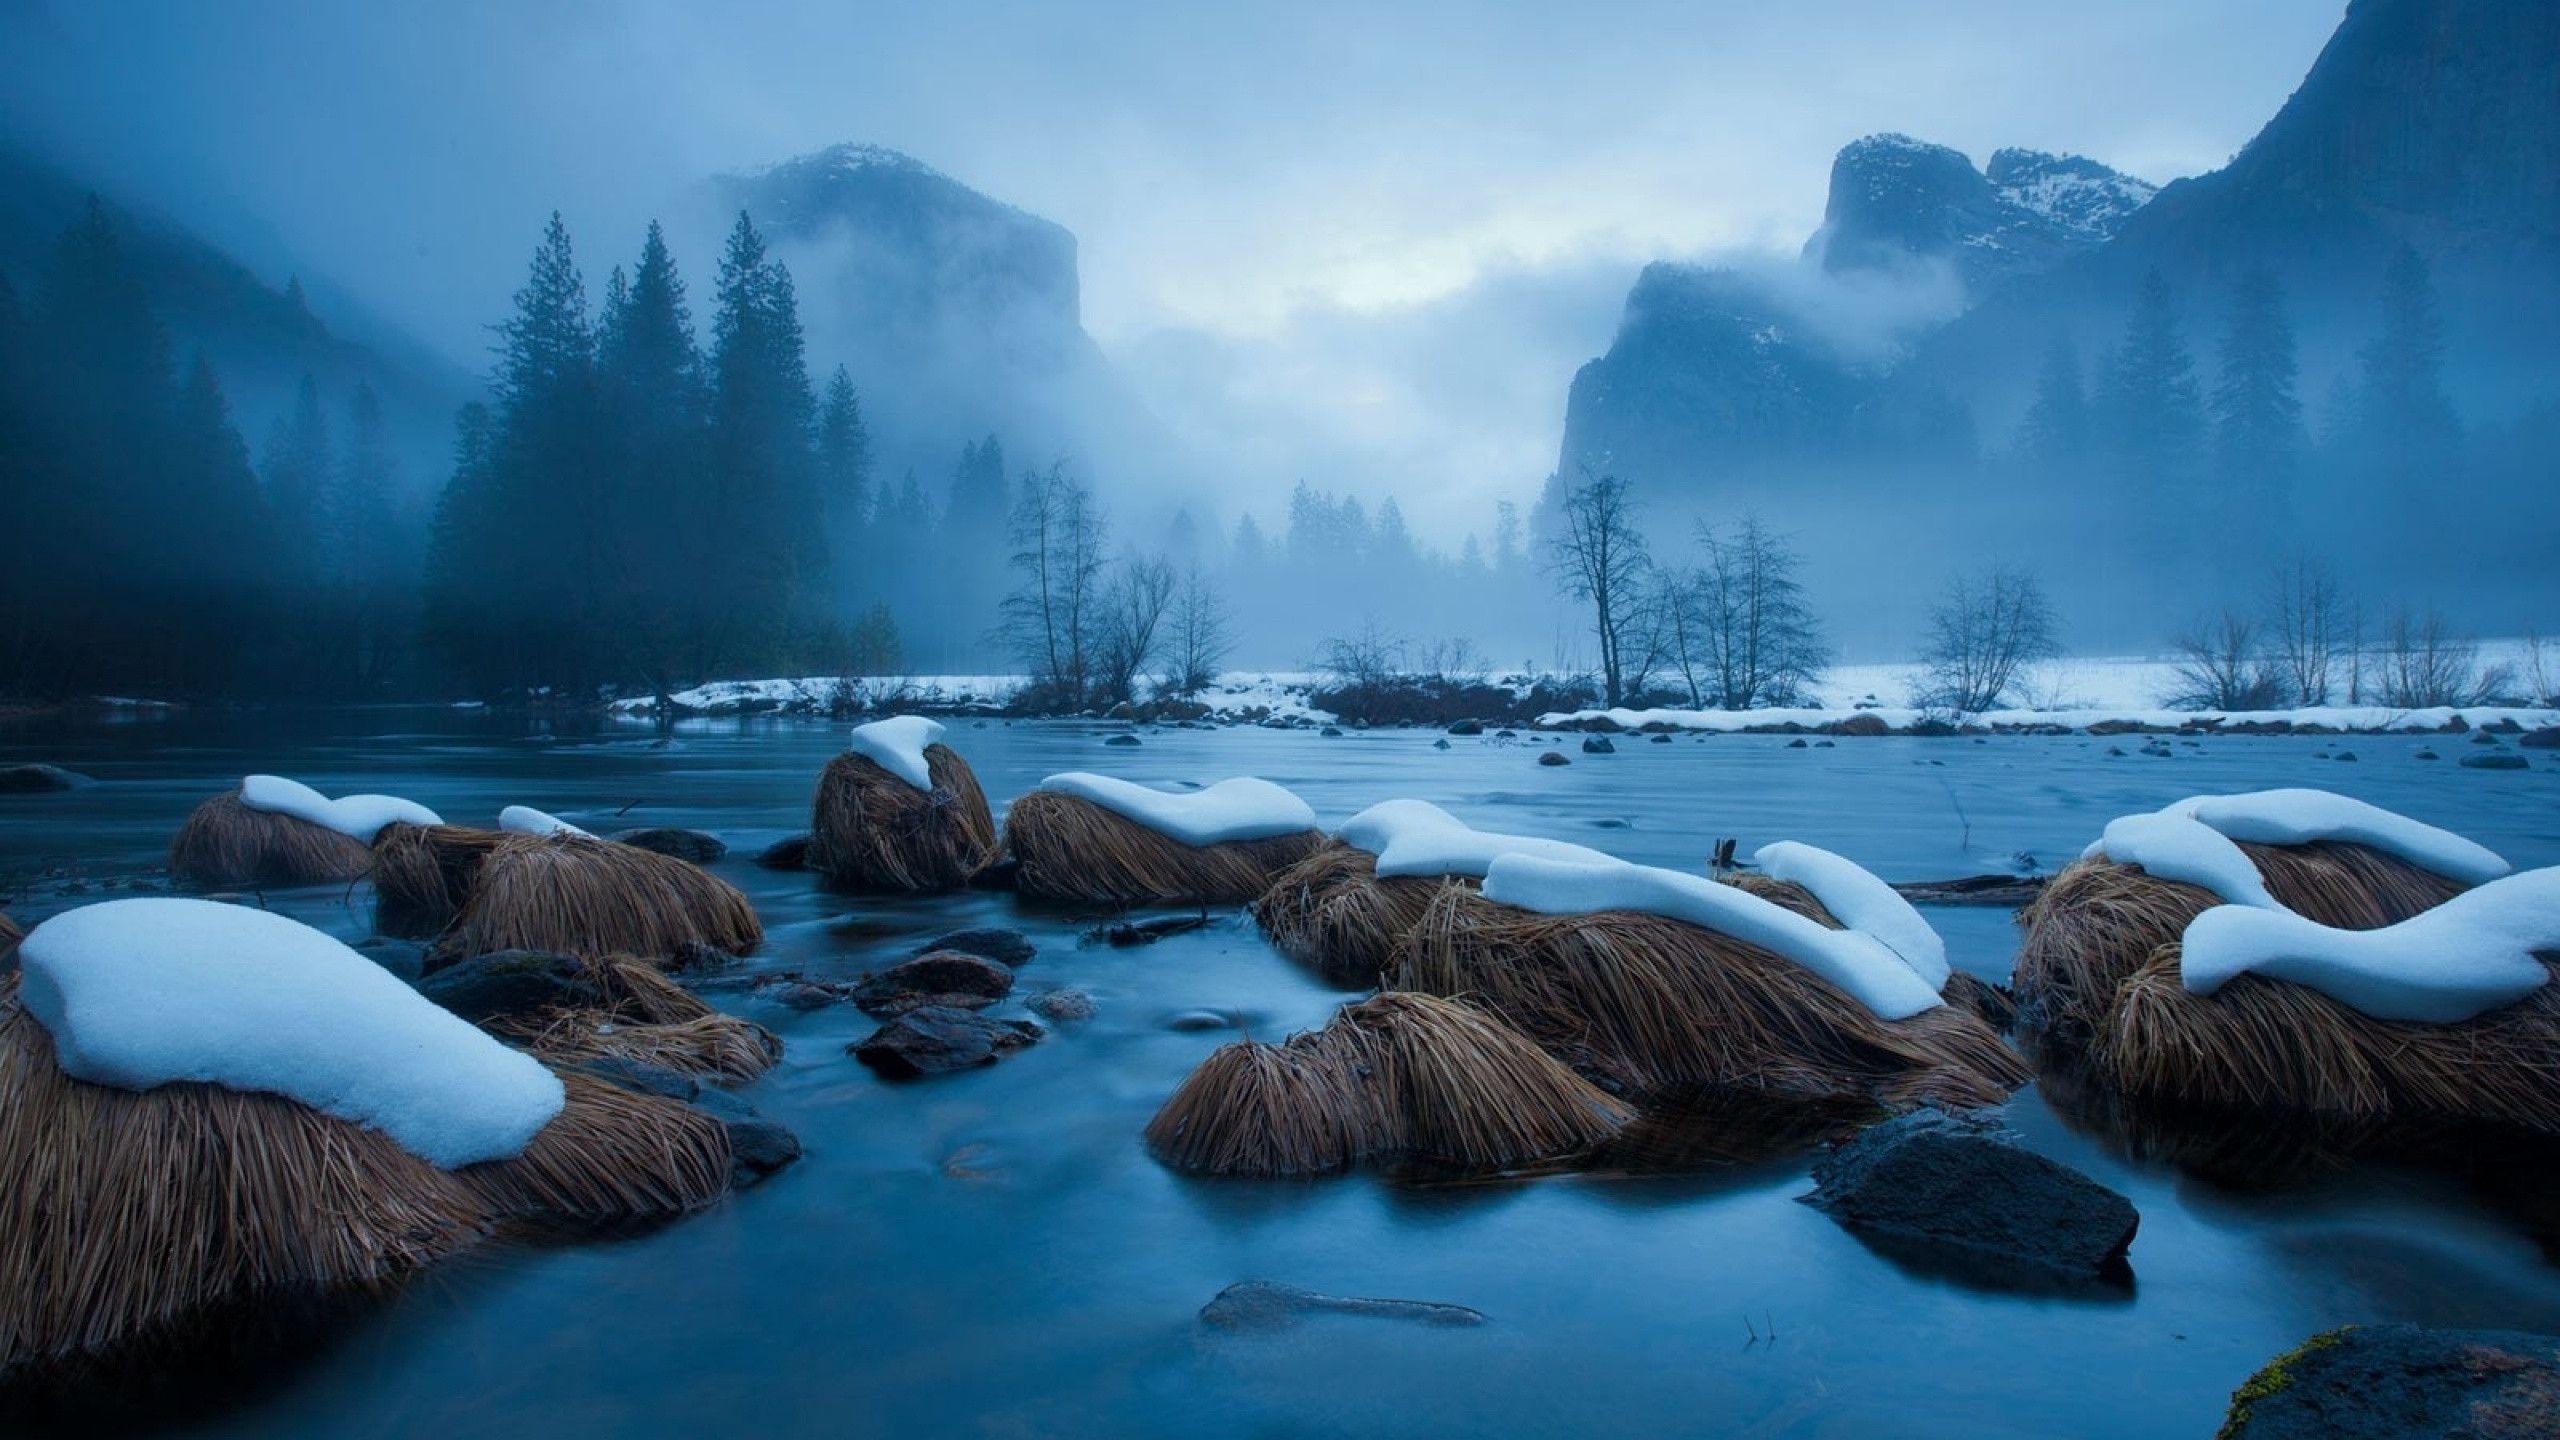 Os X Yosemite Wallpaper Apple Iphone Wallpaper 2560x1440